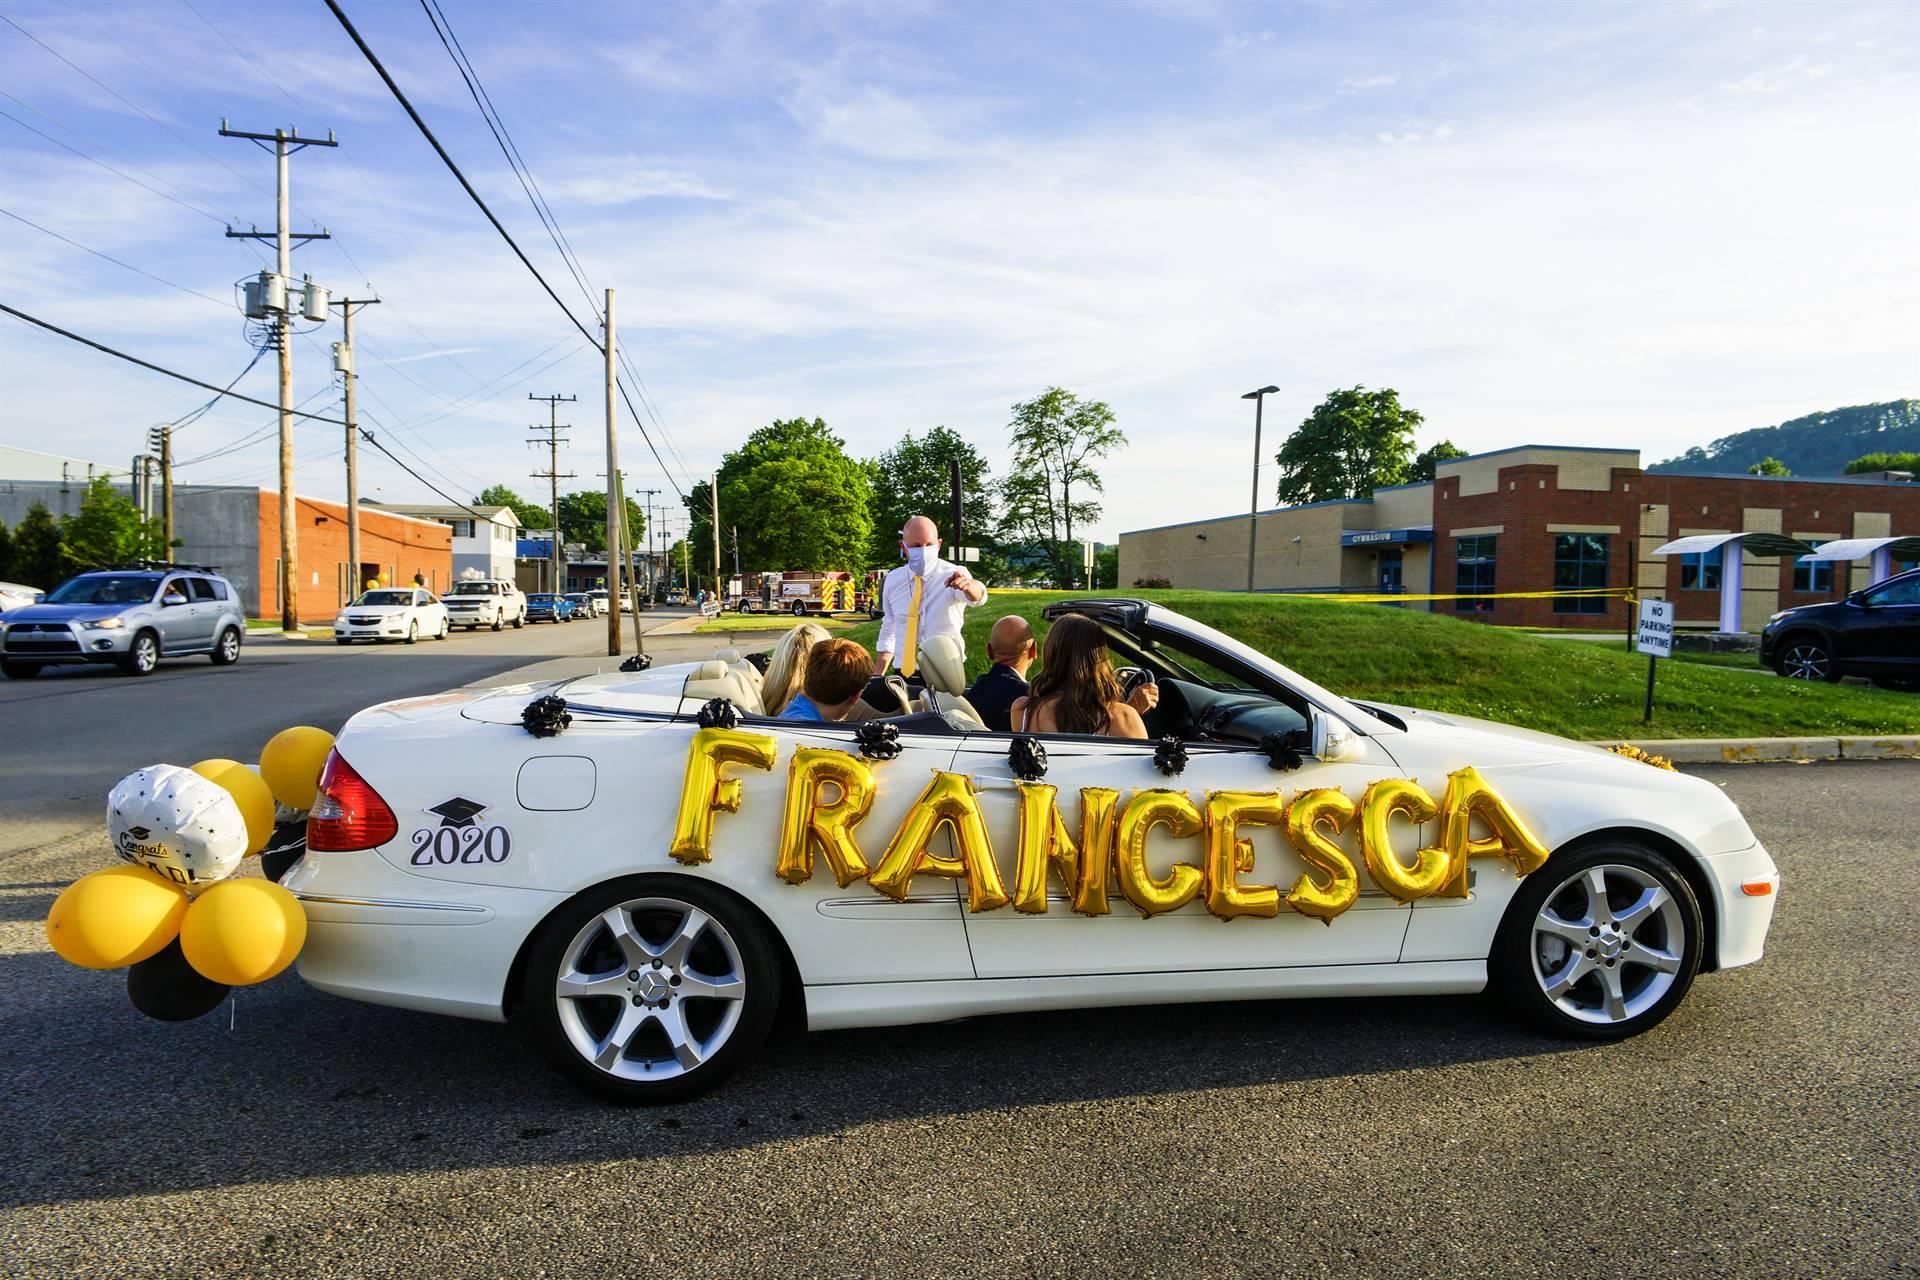 parade vehicle